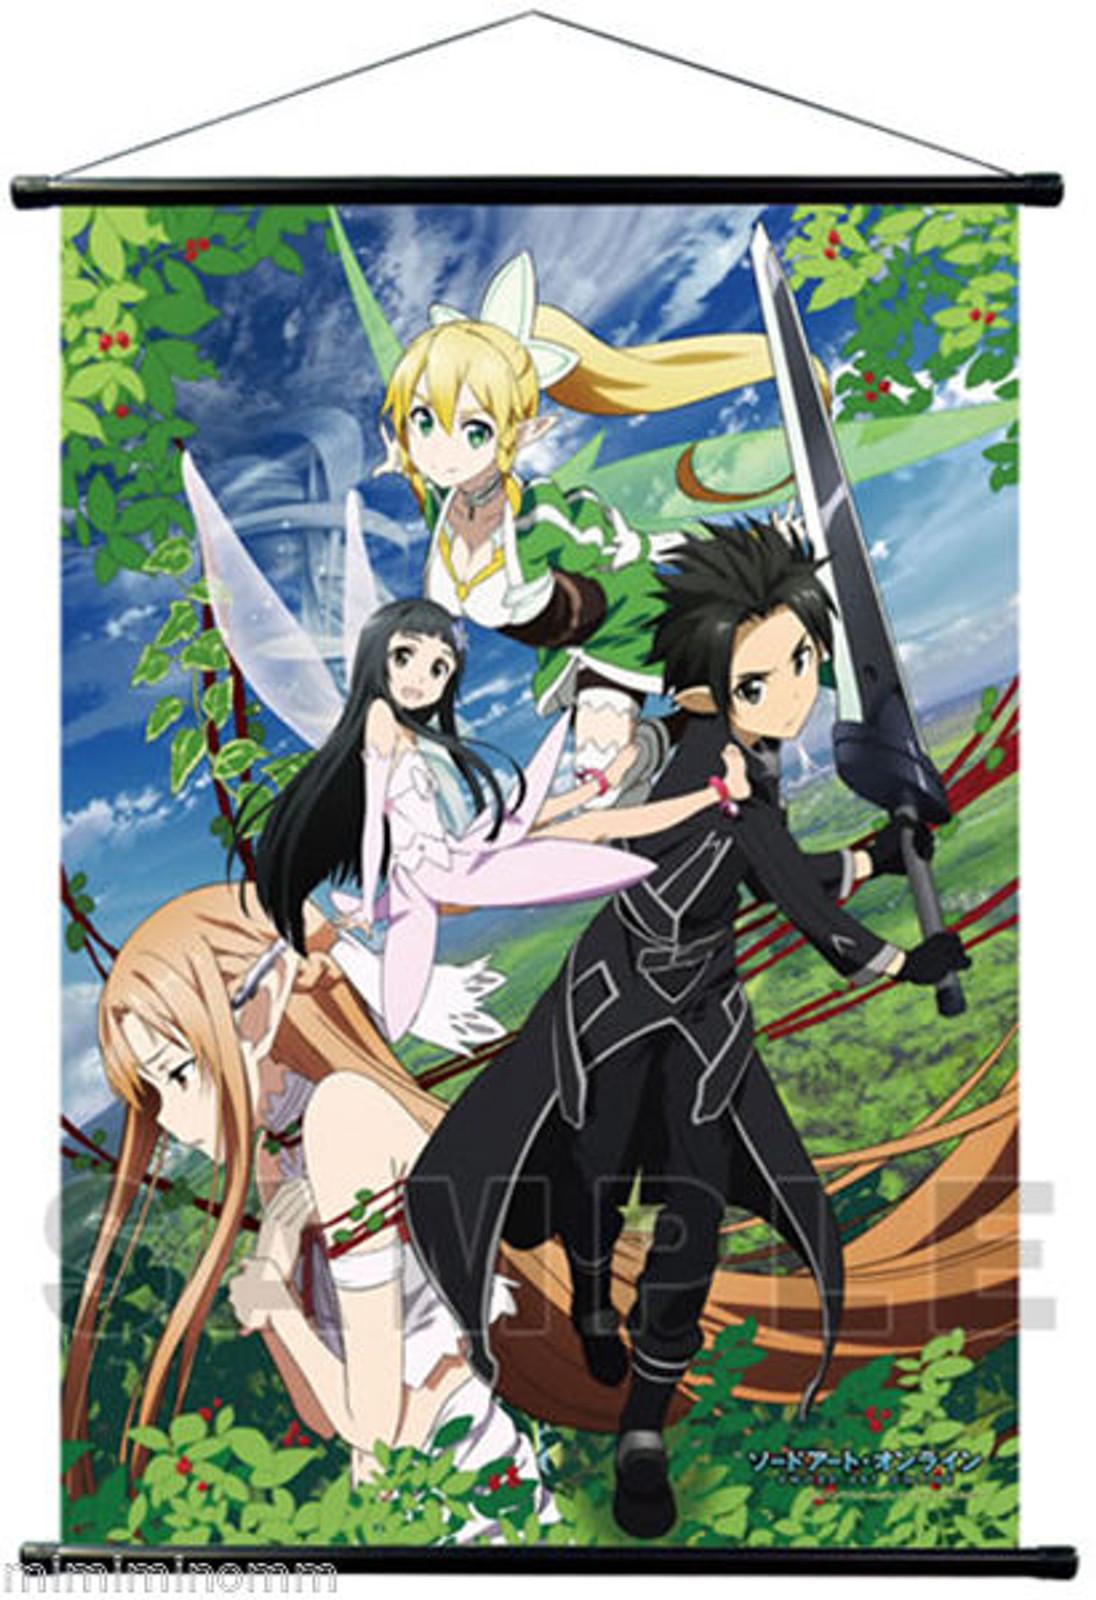 Sword Art Online B2 Big Size Tapestry Wall Scroll Poster Asuna JAPAN ANIME